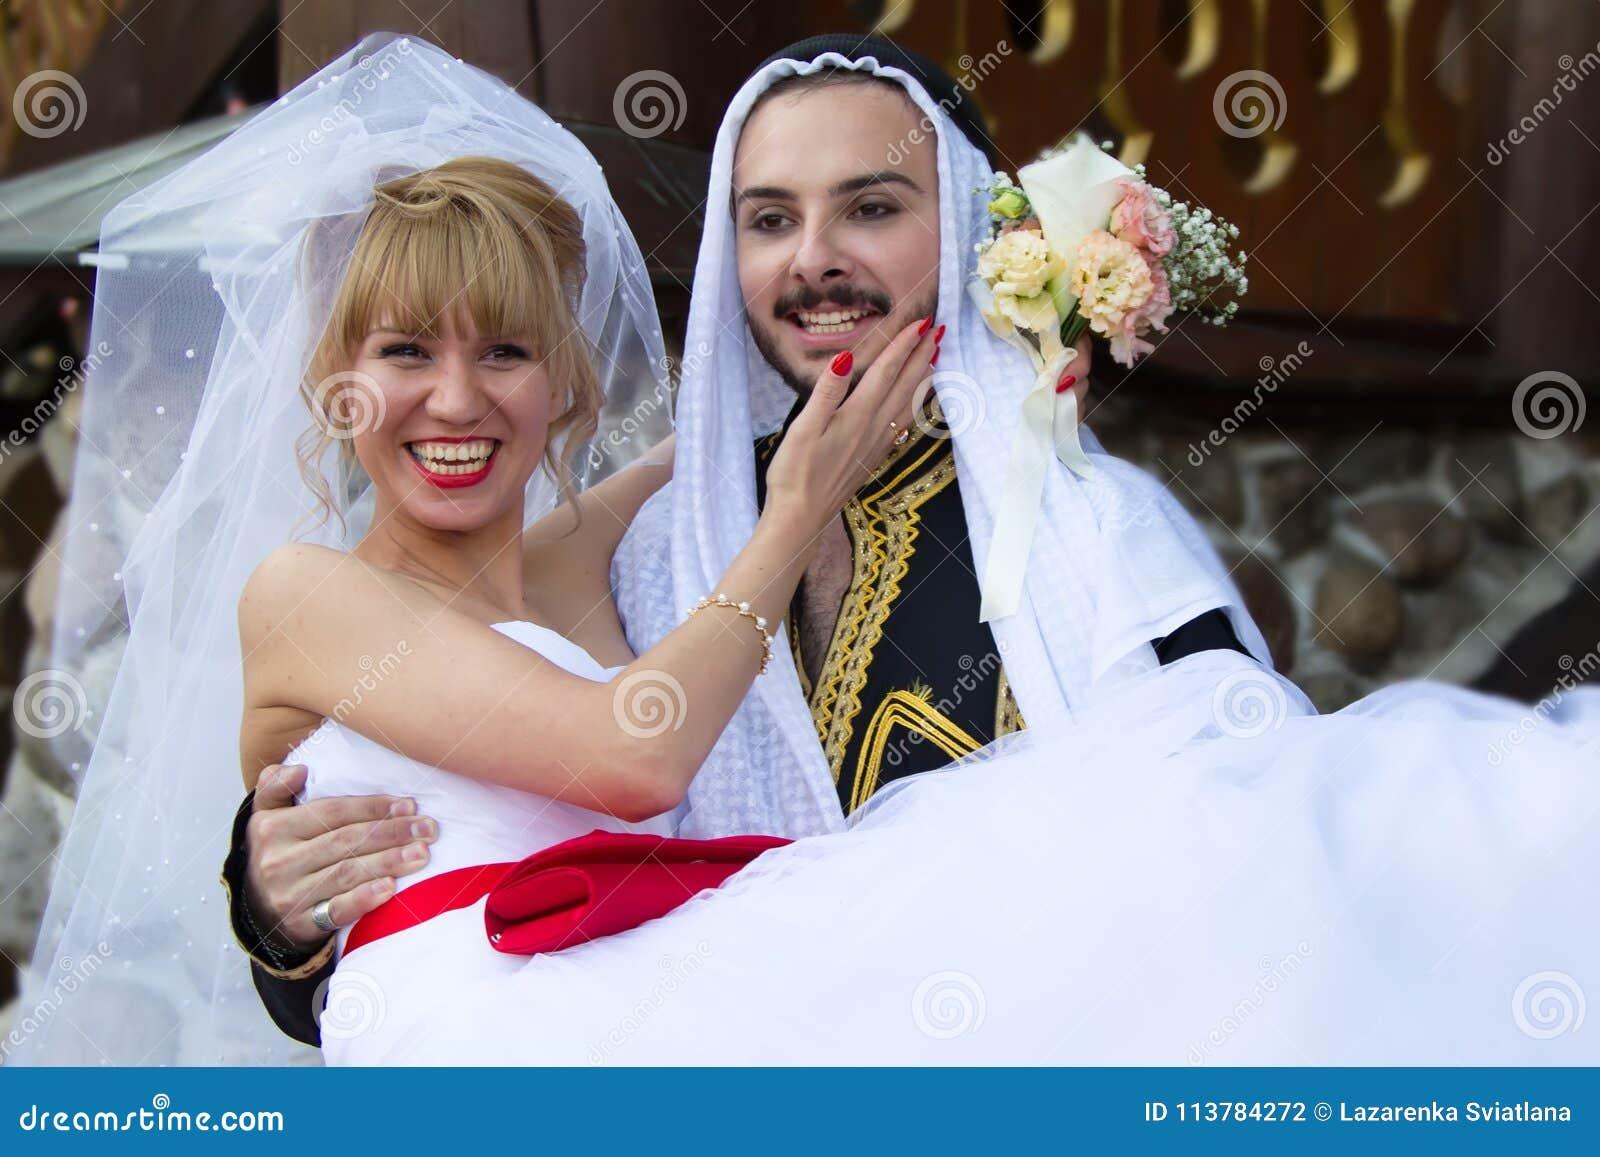 russian bride stories